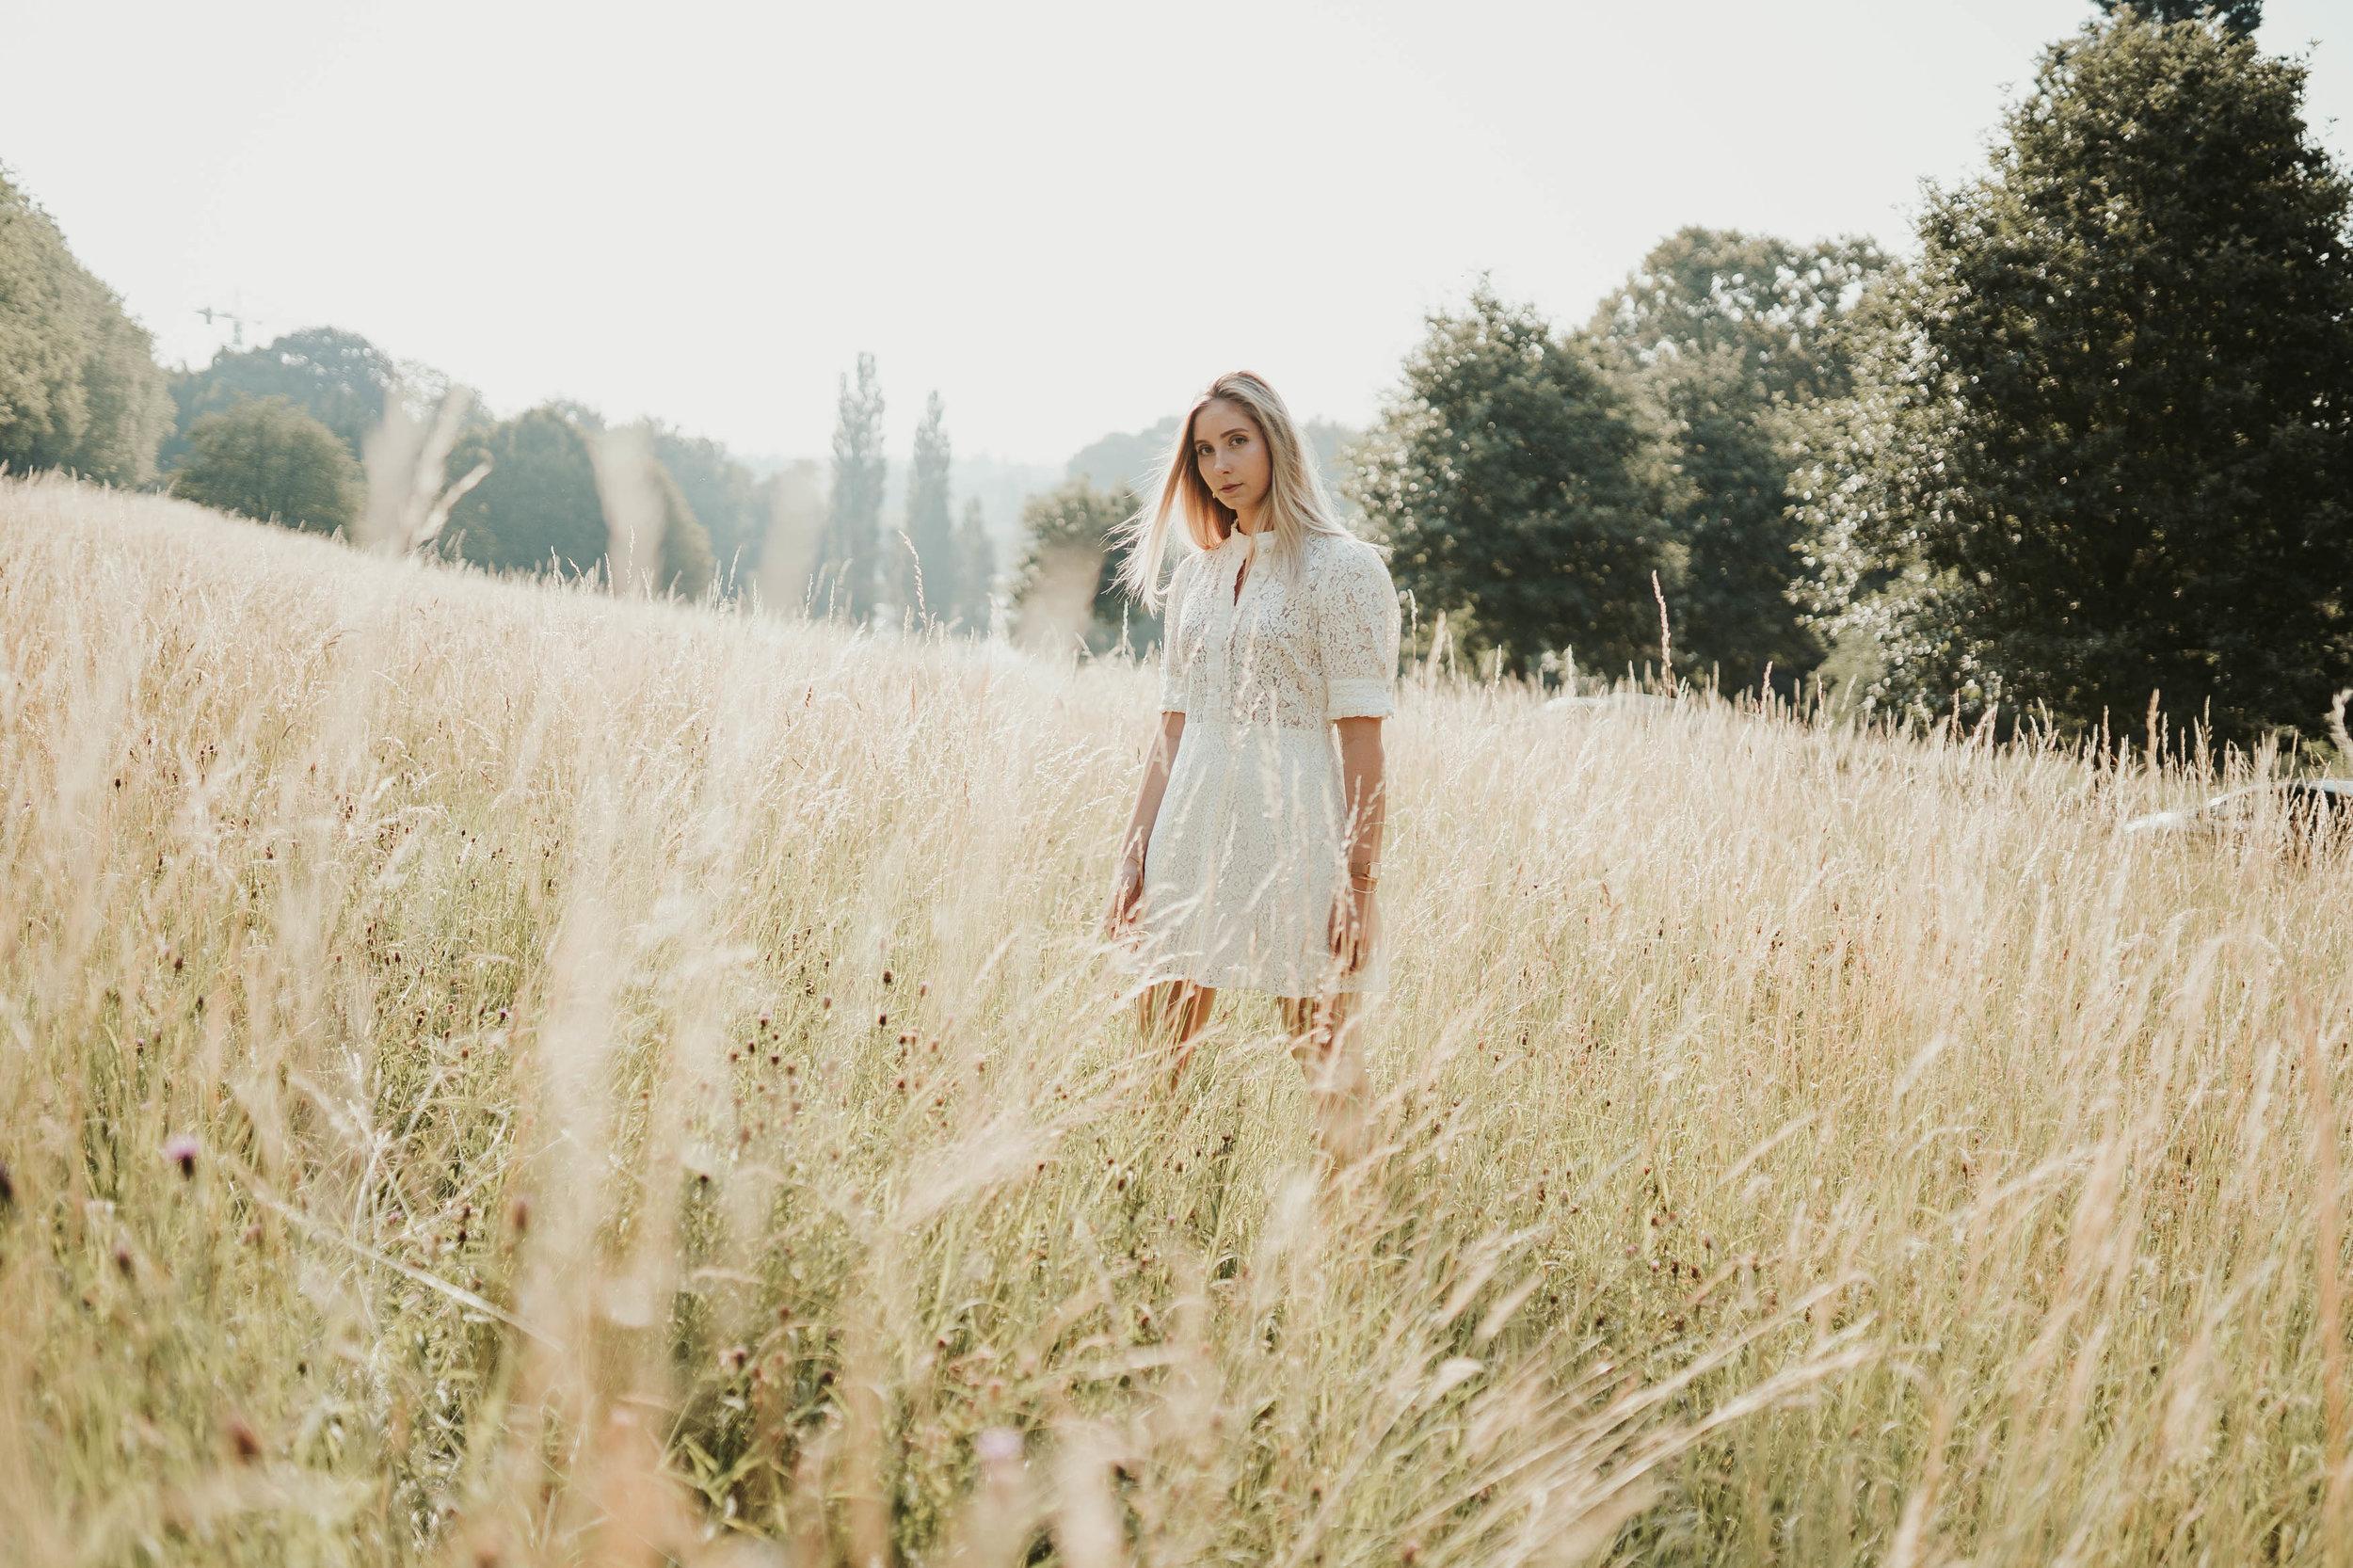 photographe_bruxelles_portrait_femme-9.jpg